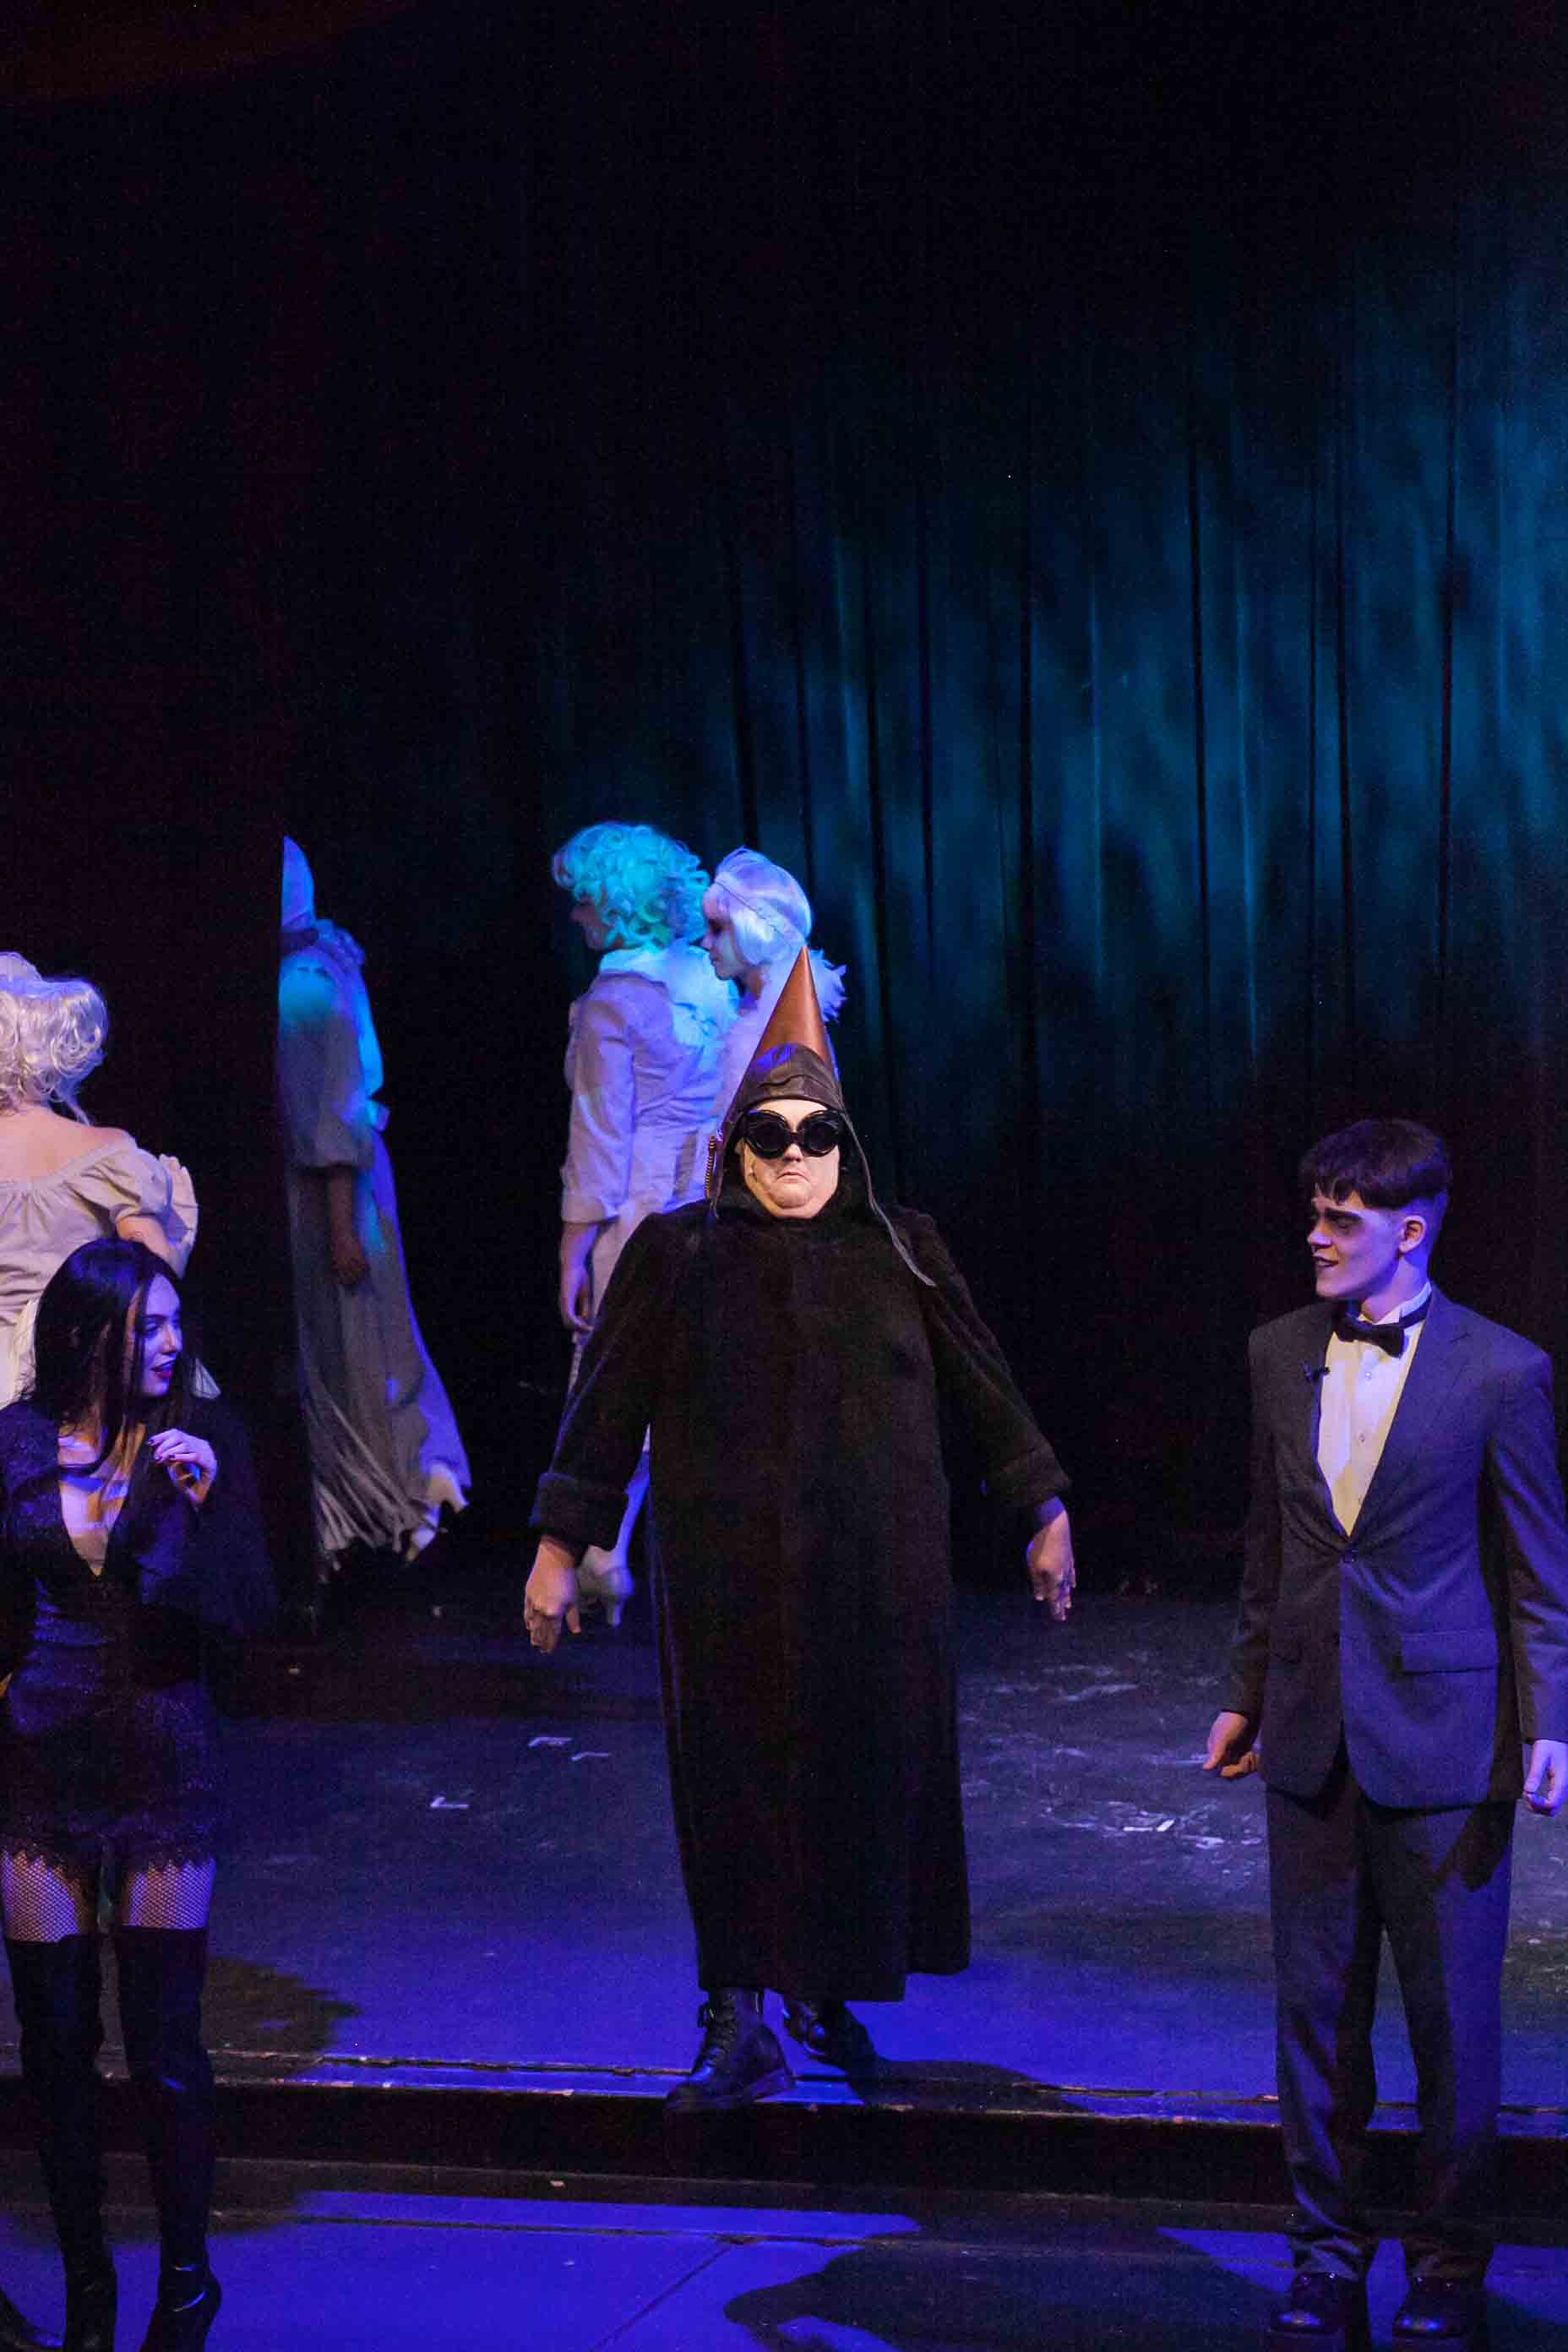 6-19-16 Addams Family Kooky Cast 0424.jpg